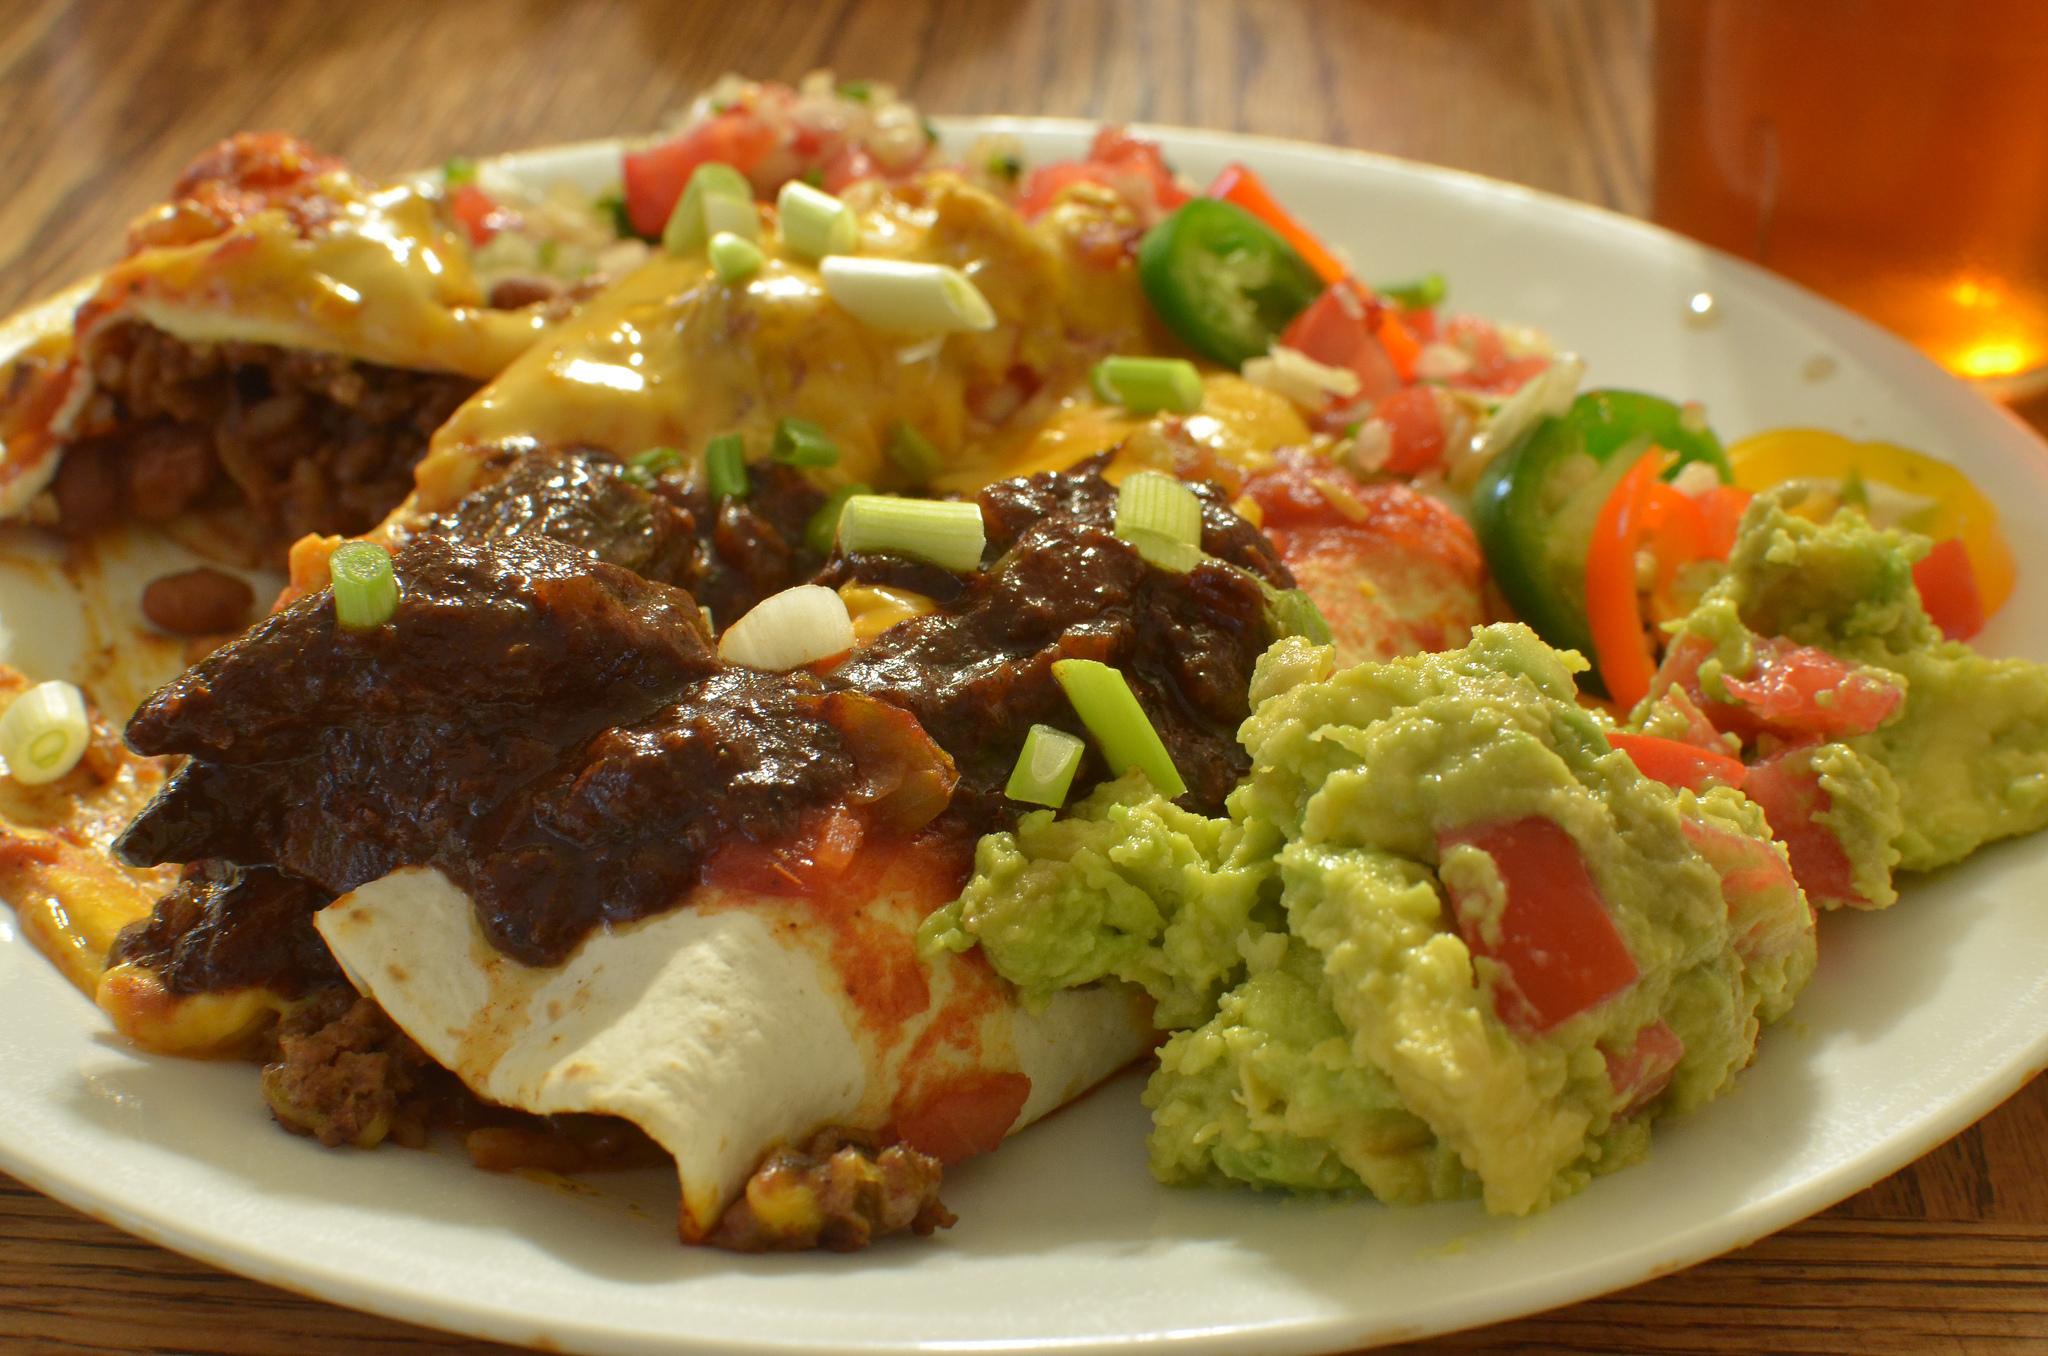 Mmm... enchiladas,